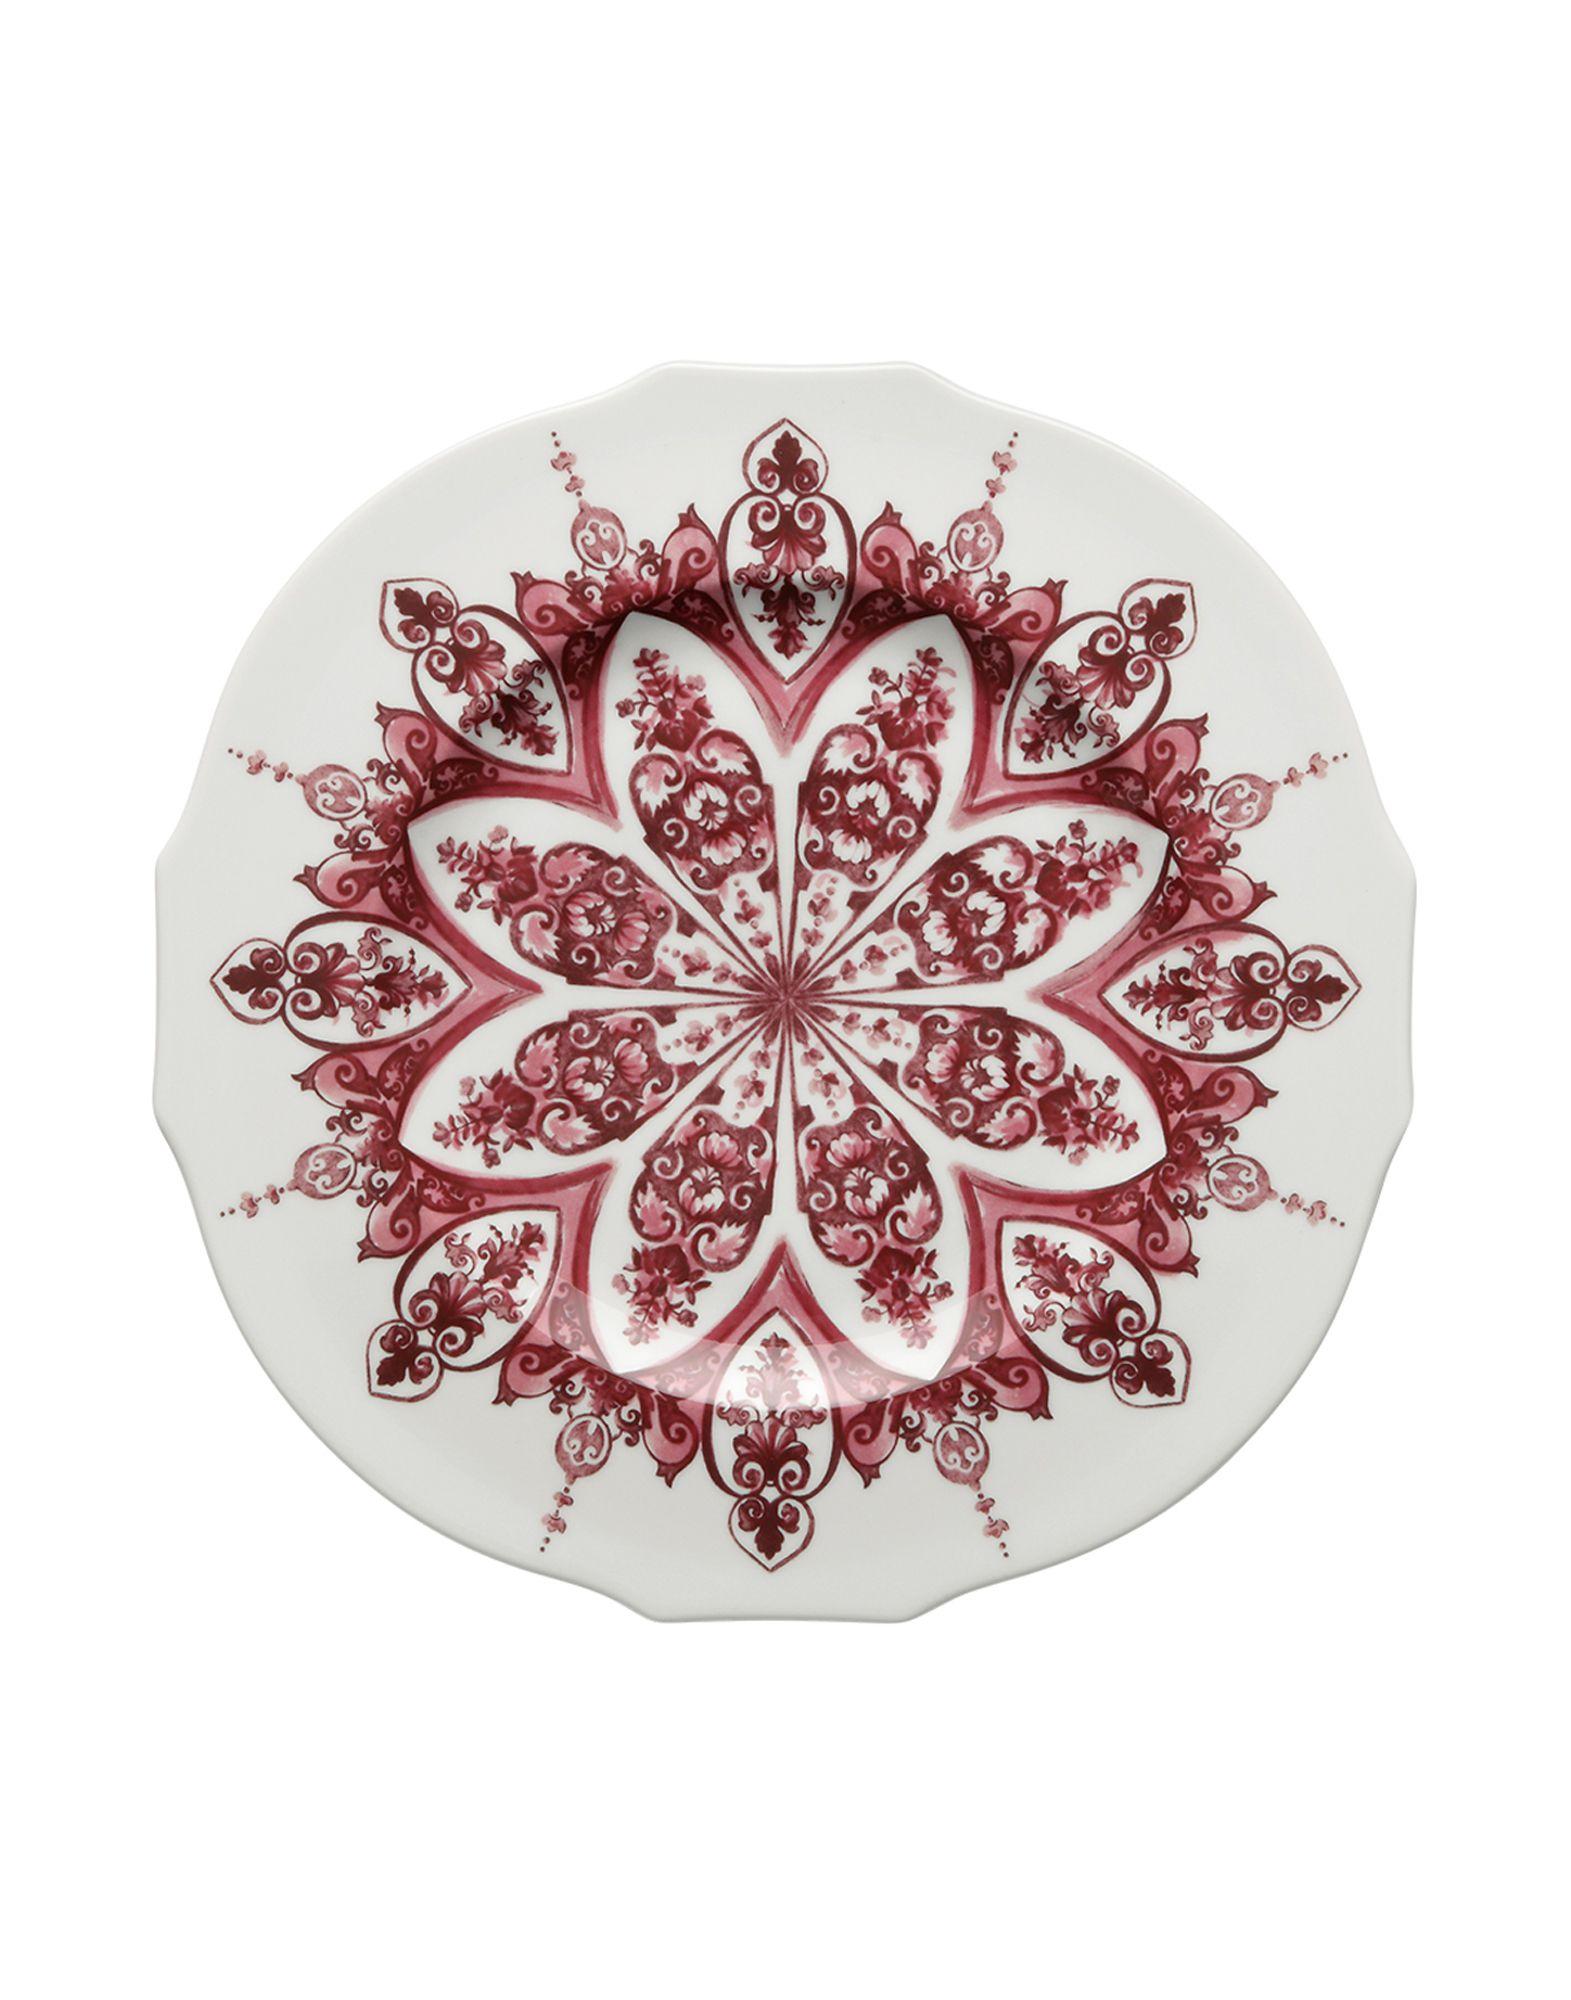 RICHARD GINORI Декоративная тарелка seletti wears toiletpaper декоративная тарелка